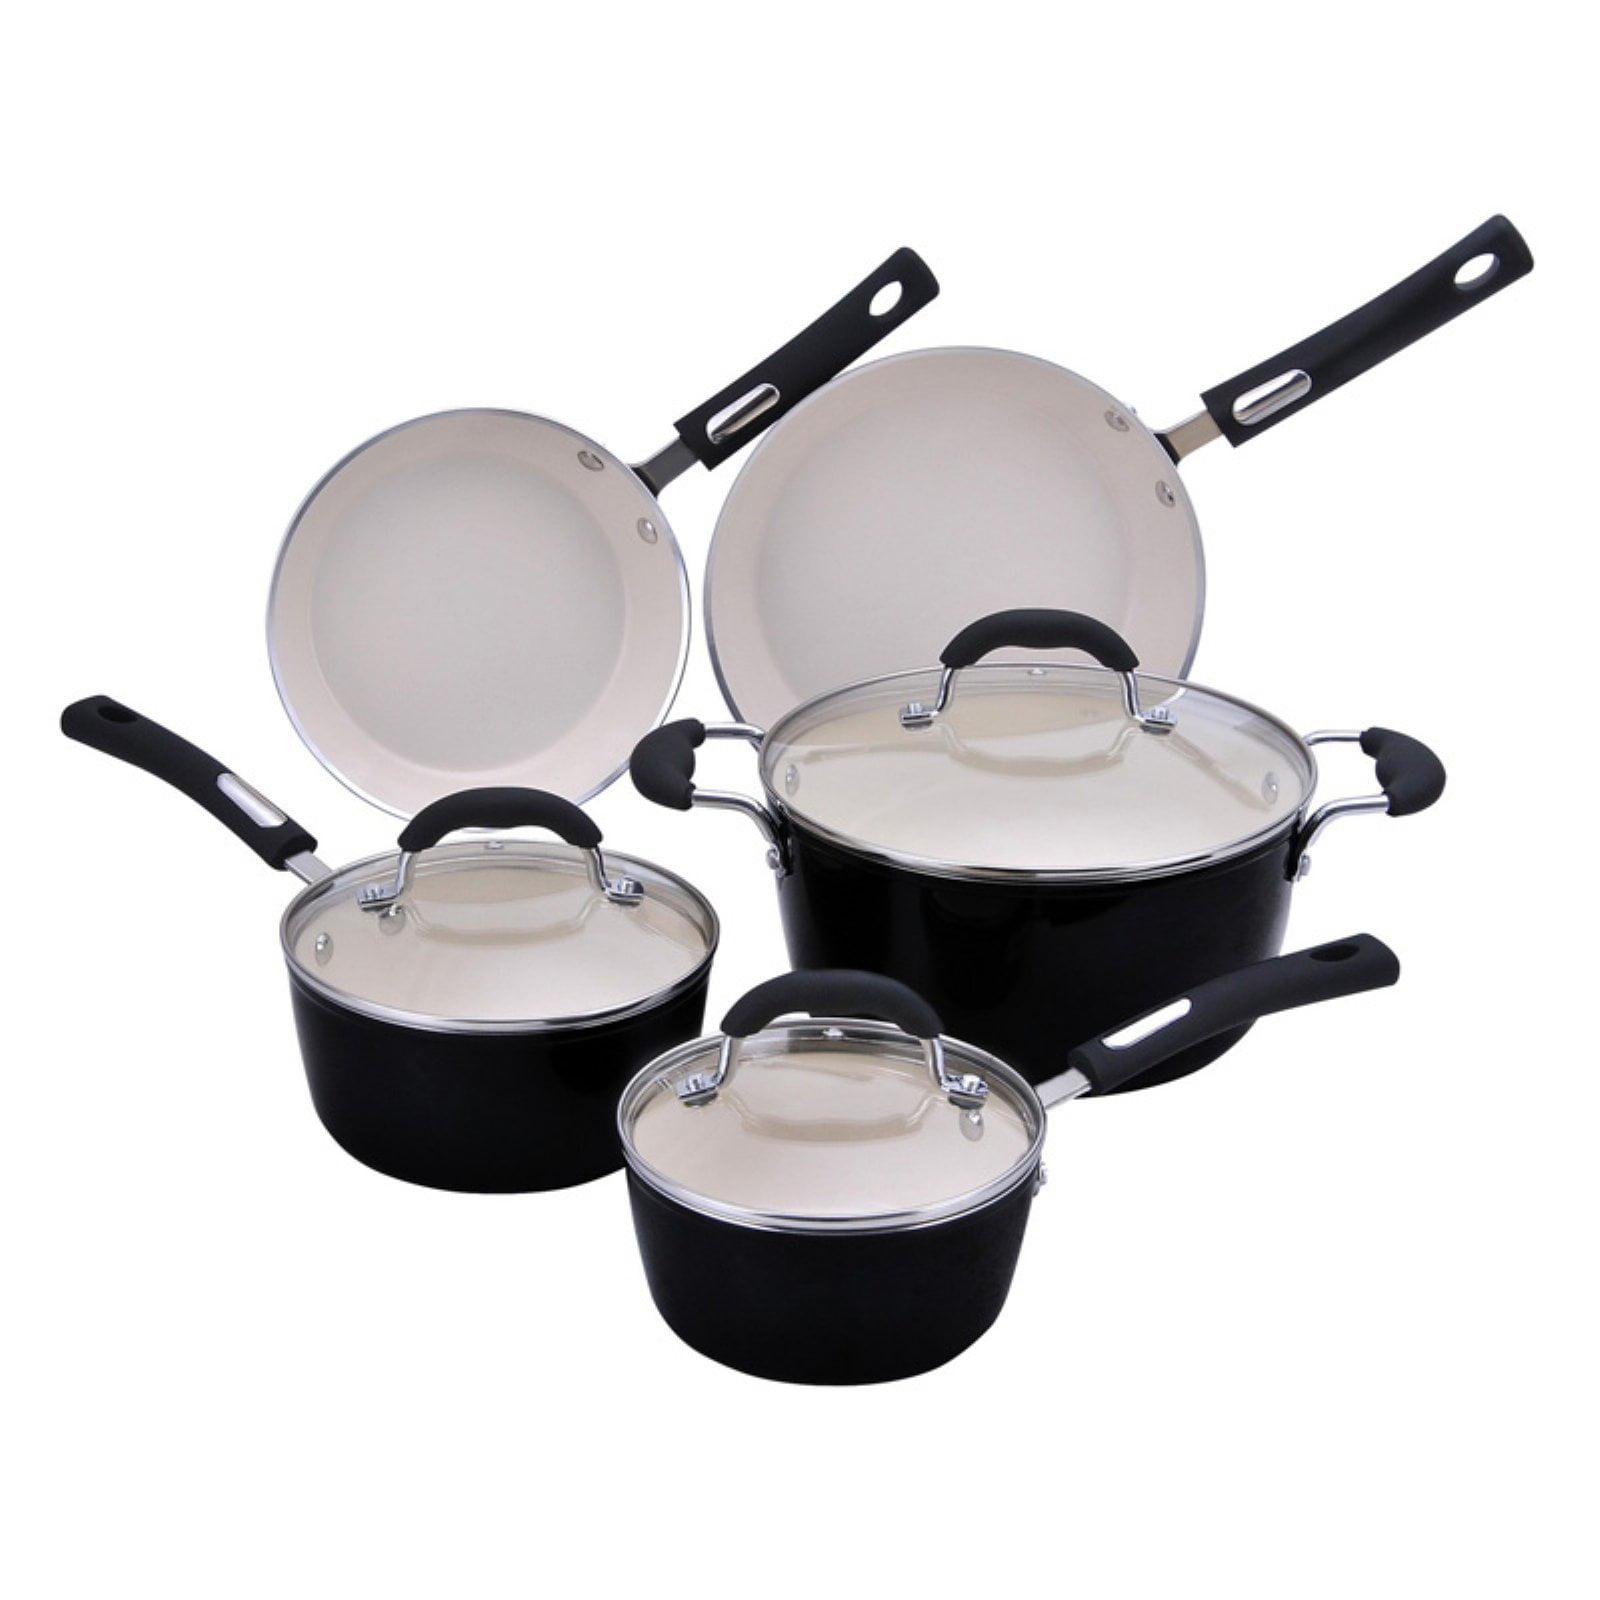 Hamilton Beach 8pc Aluminum Cookware Set, 3.0mm Forged, Black Porcelain Enamel, Cream Ceramic Non-Stick